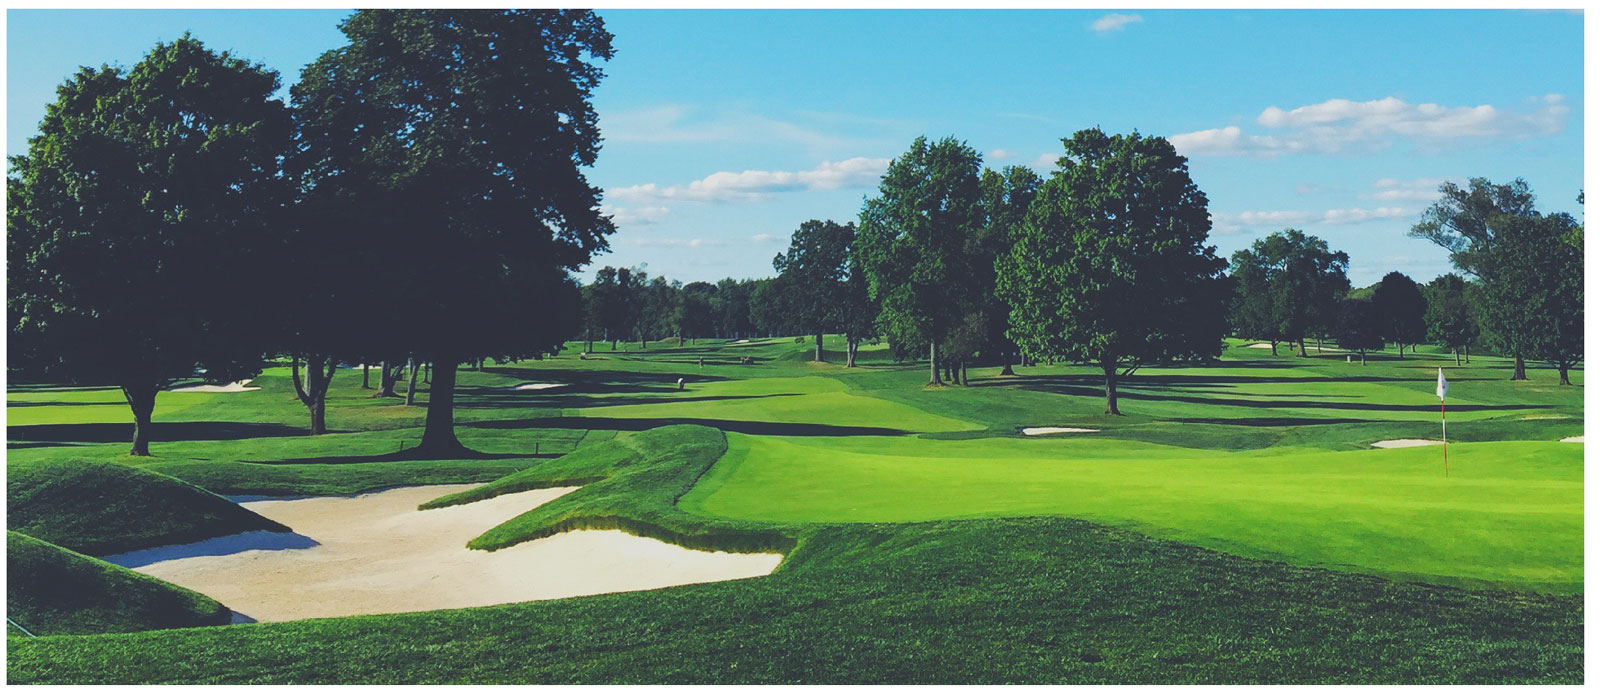 Golf2019.jpg